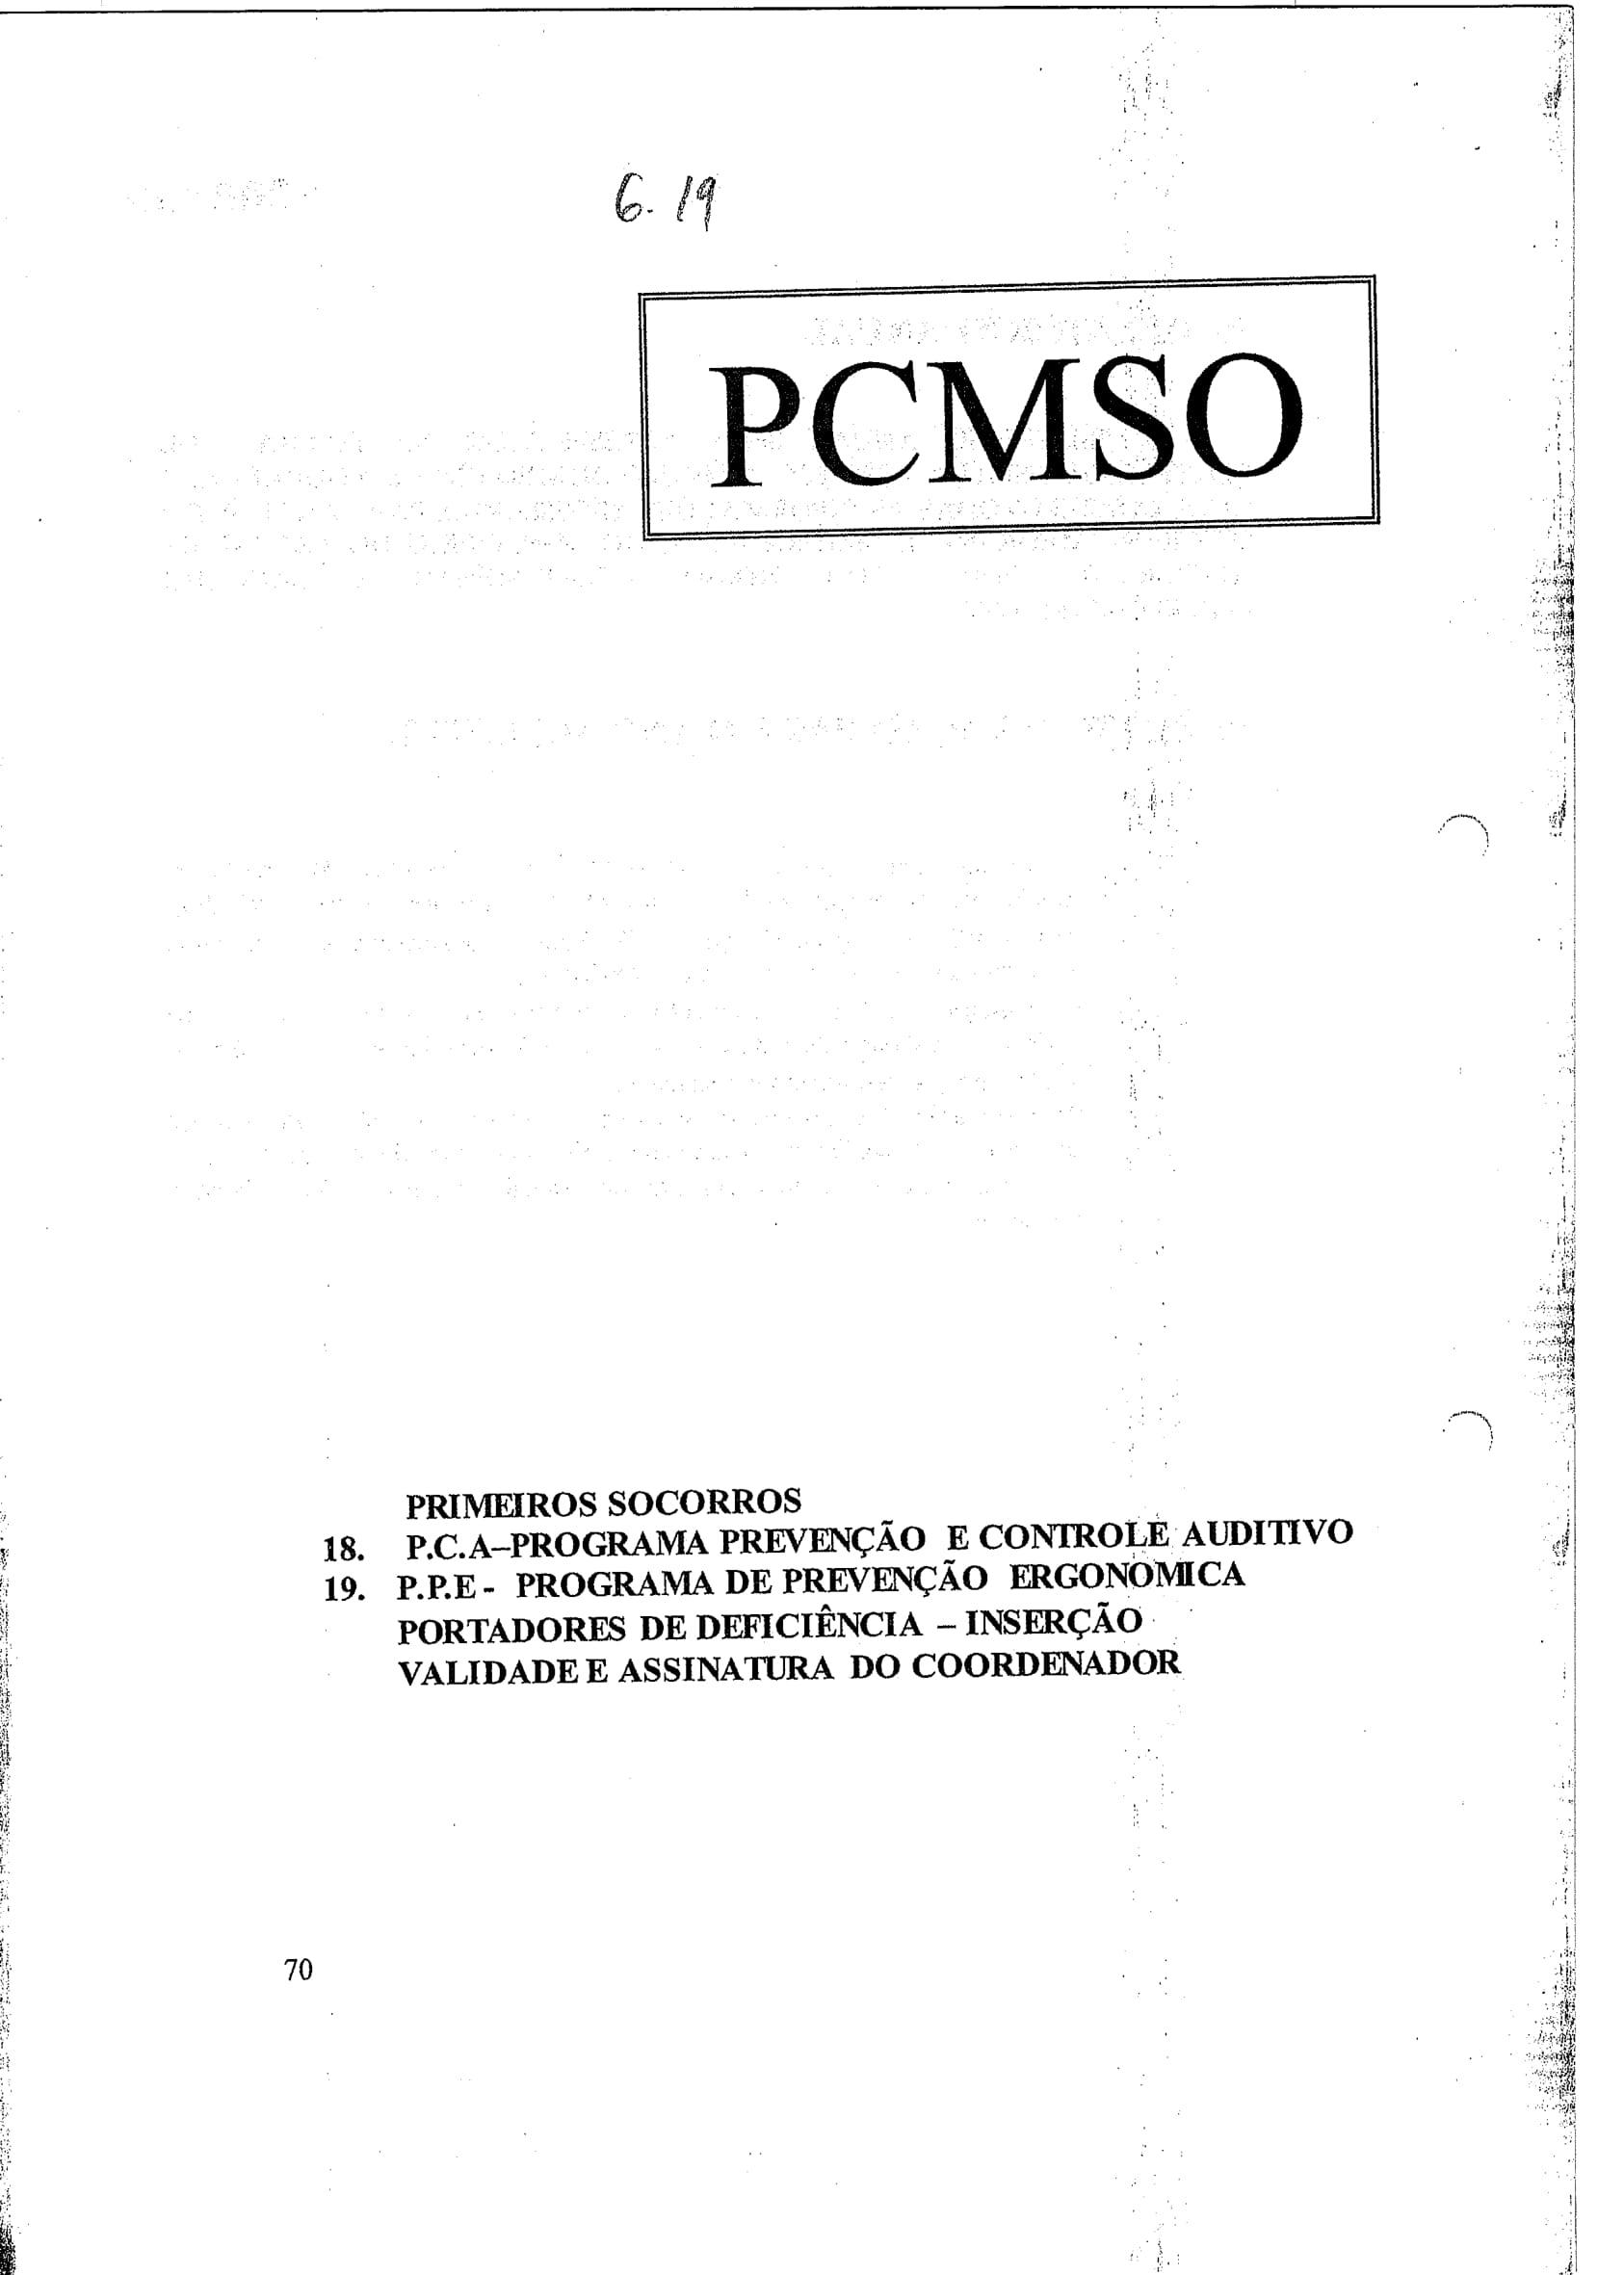 PL001222019-148